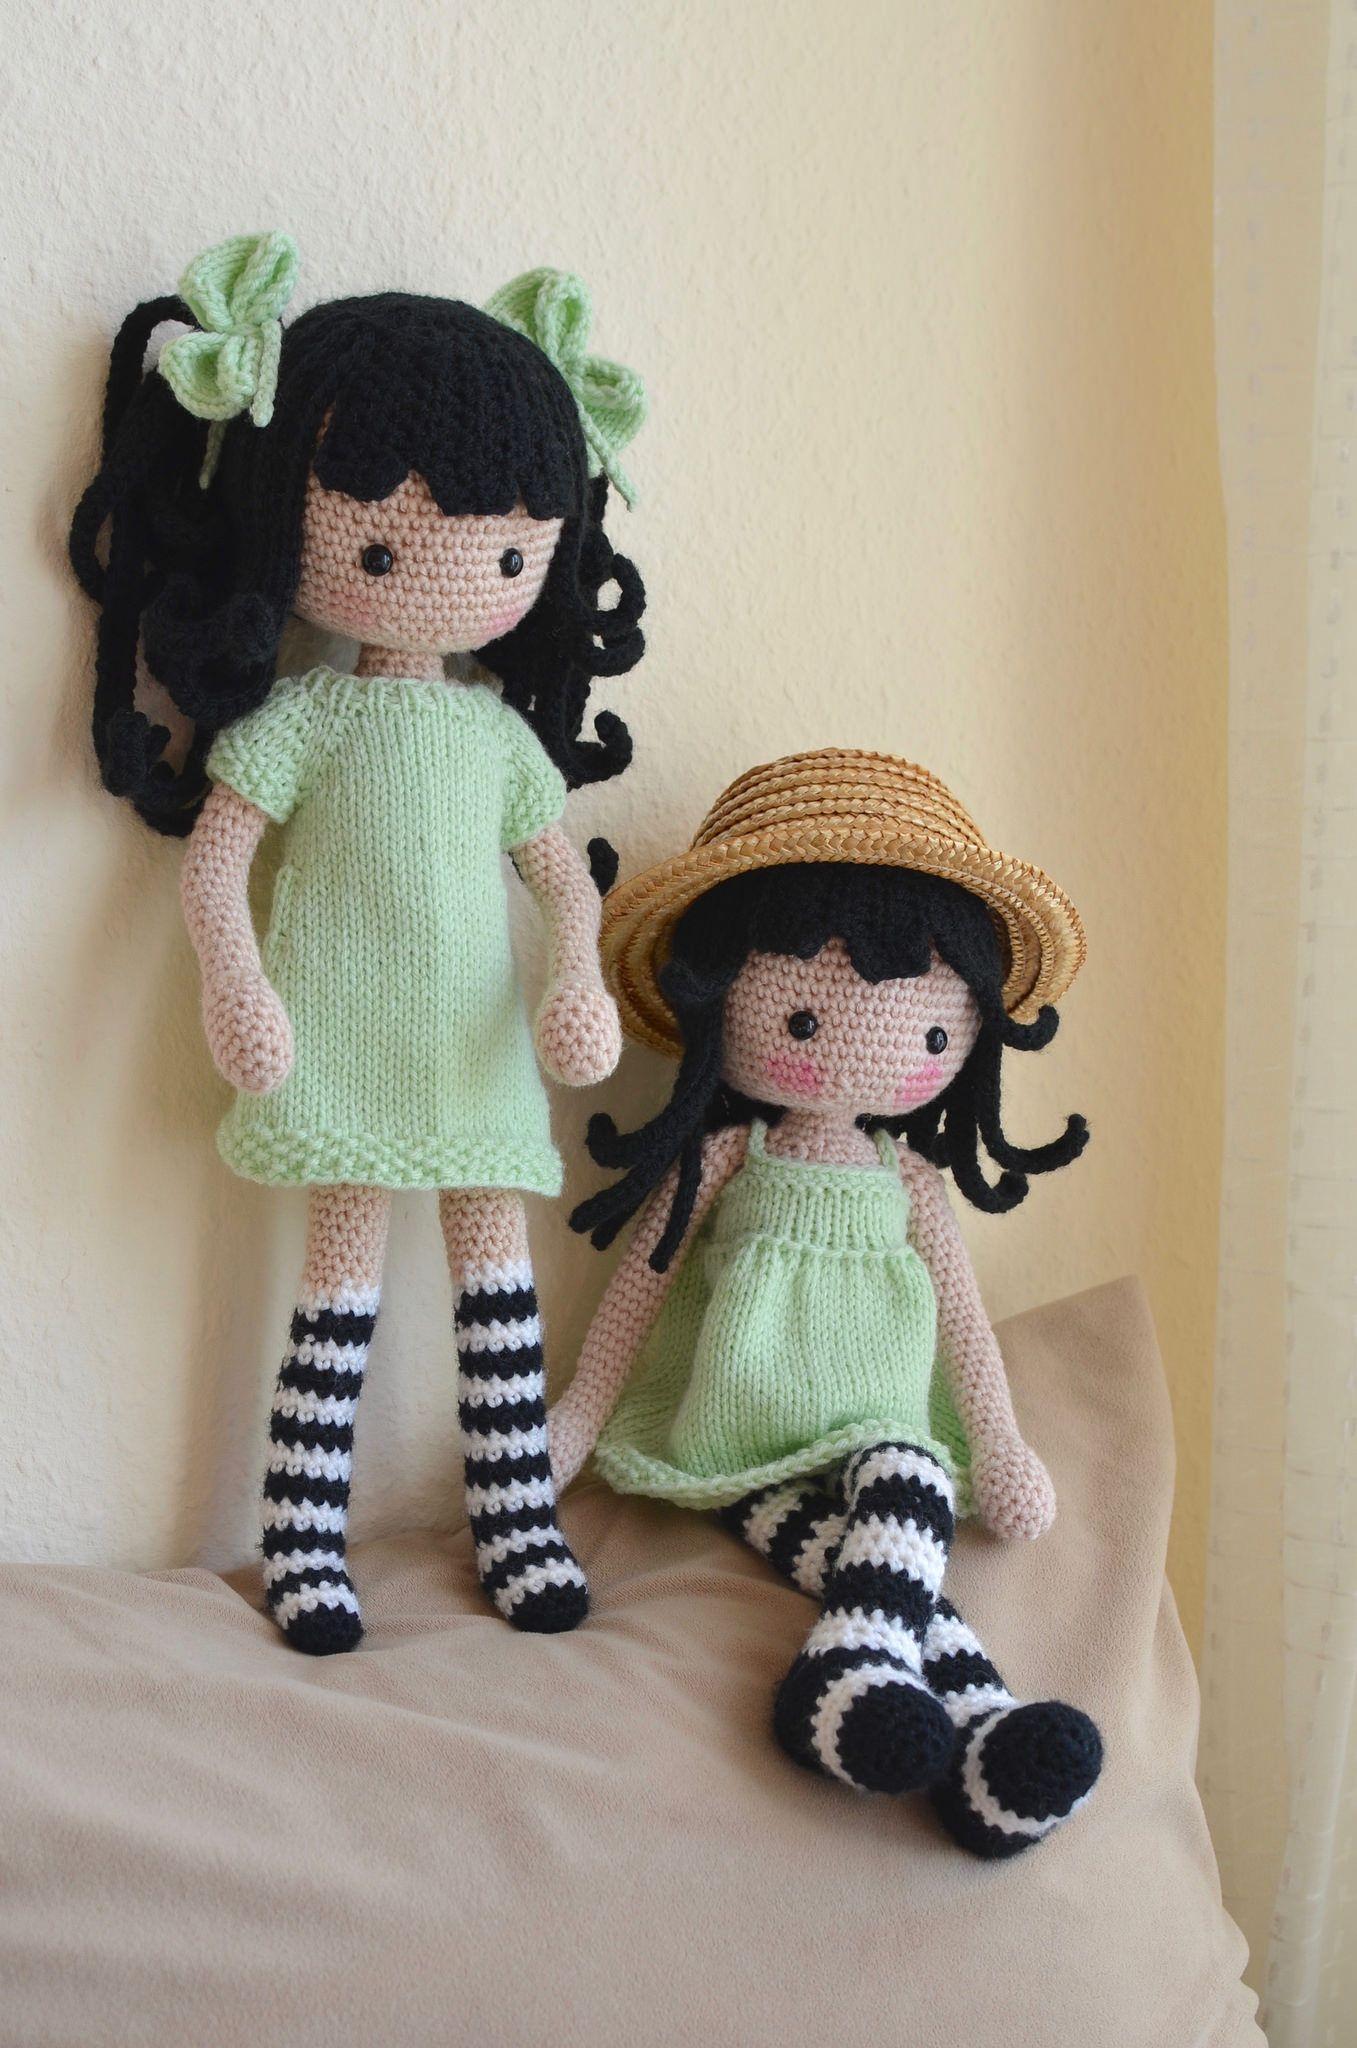 Knit Amigurumi Doll Pattern : Sisters amigurumi summer and dolls